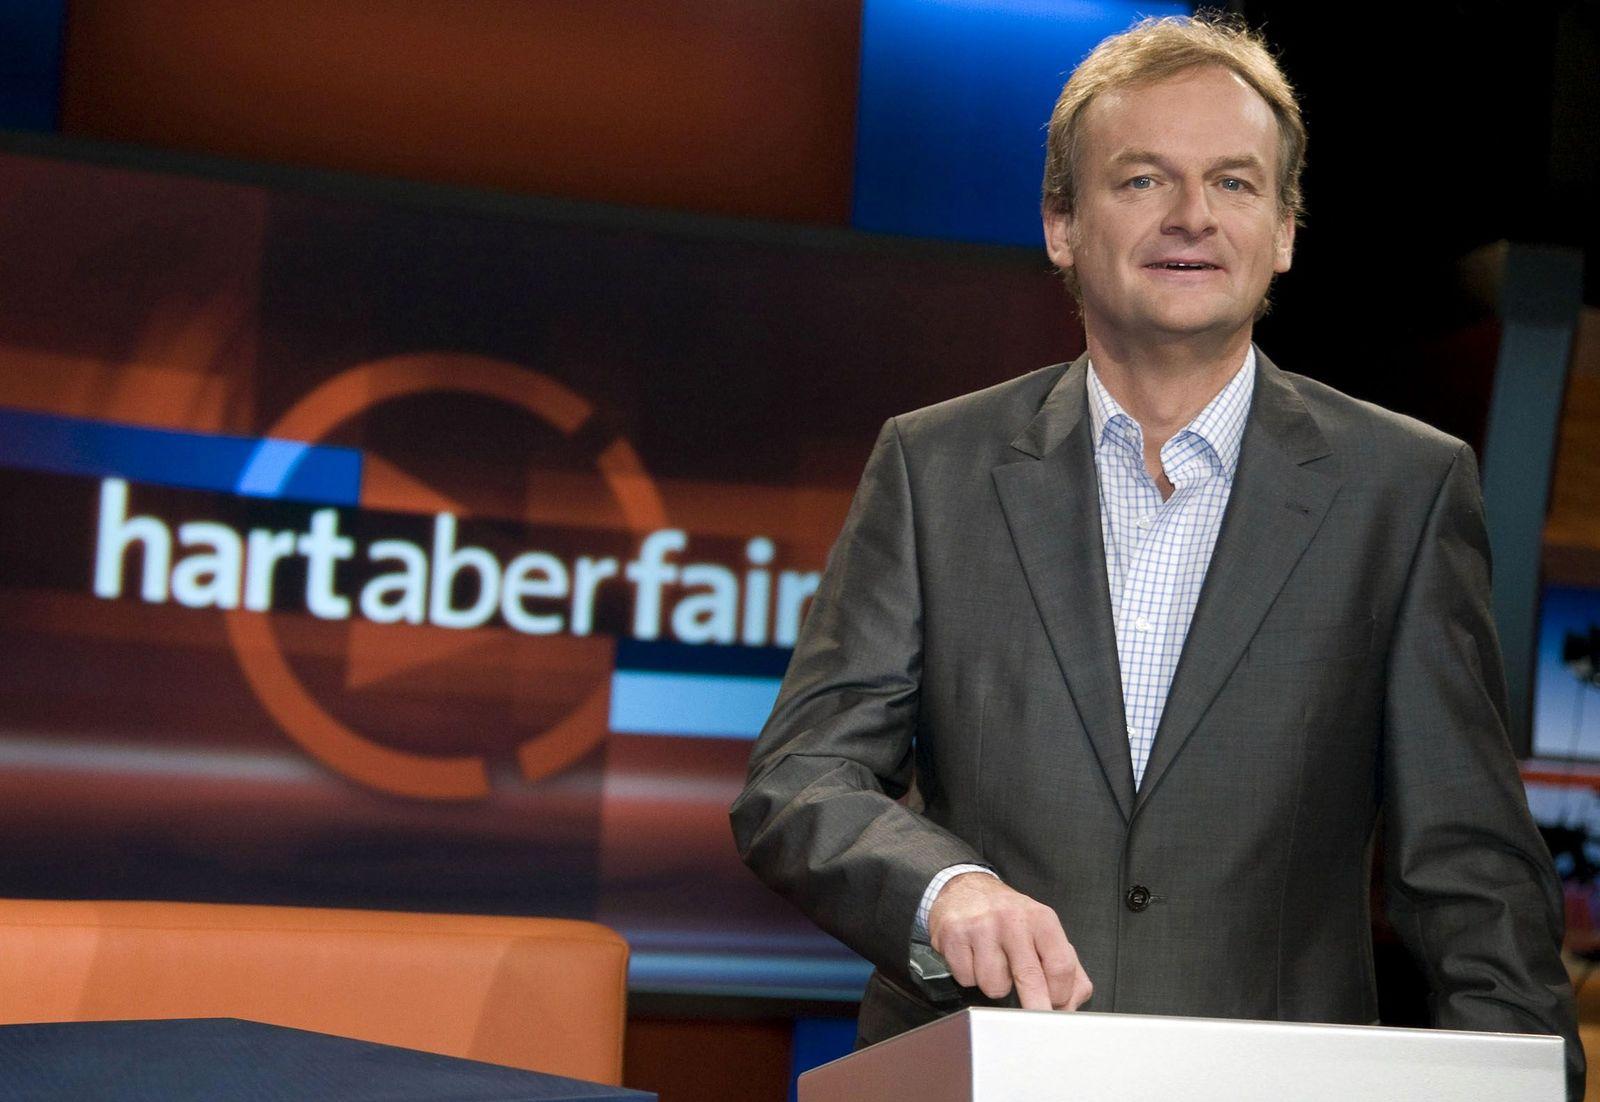 Hart Aber Fair/ Symbol